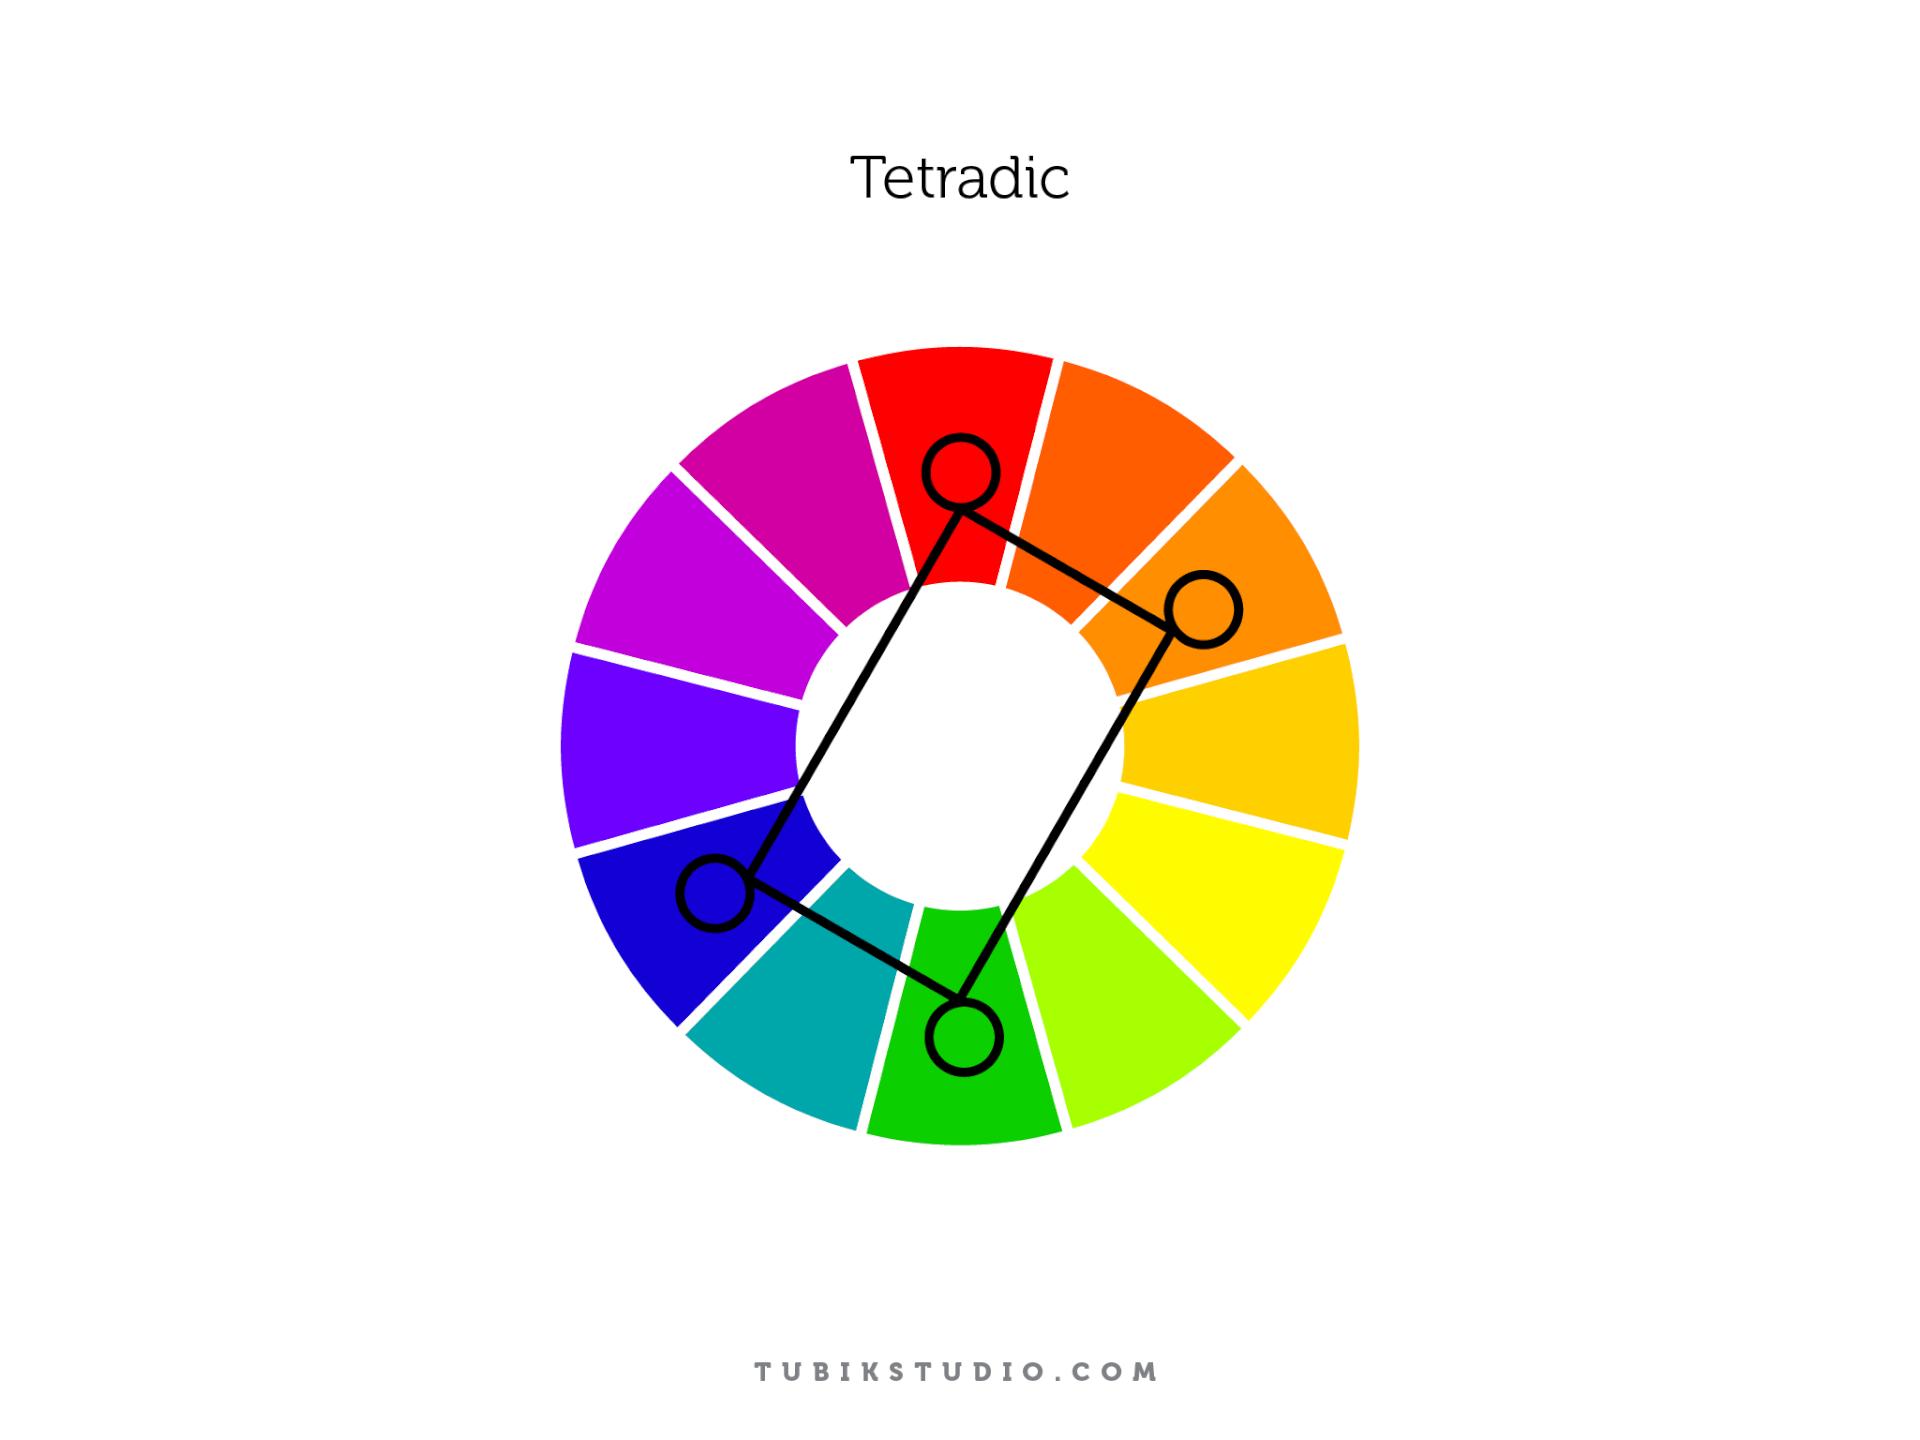 color_wheel tubik tetradic